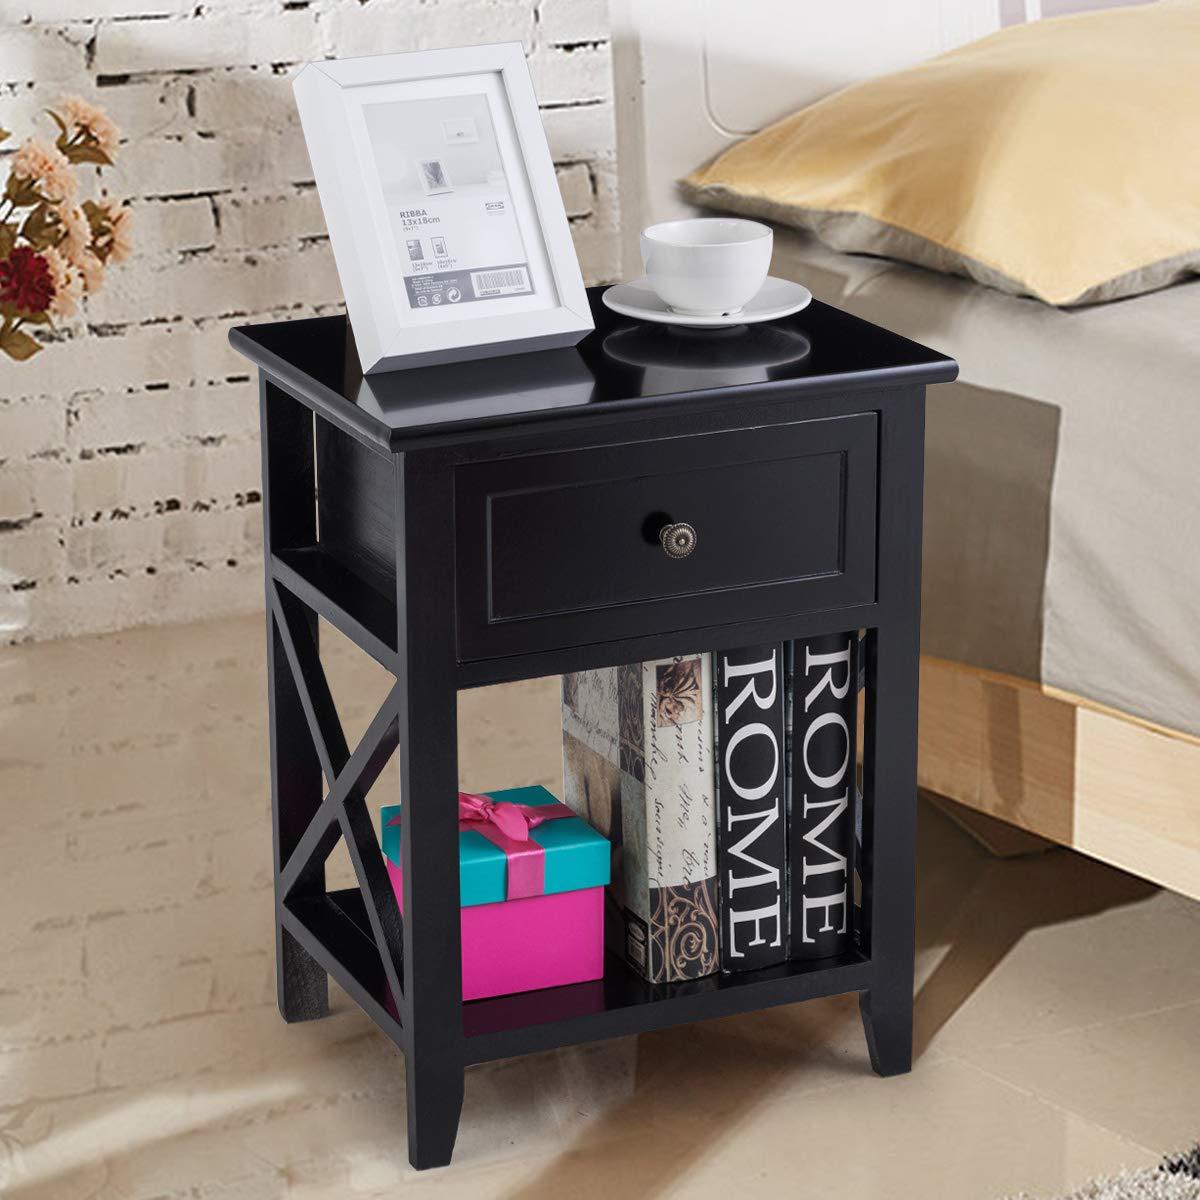 Giantex 2 Pcs Nightstand End Bedside Table Home Bedroom Furniture X-Shape W/Bottom Open Shelf Drawer, Black by Giantex (Image #3)